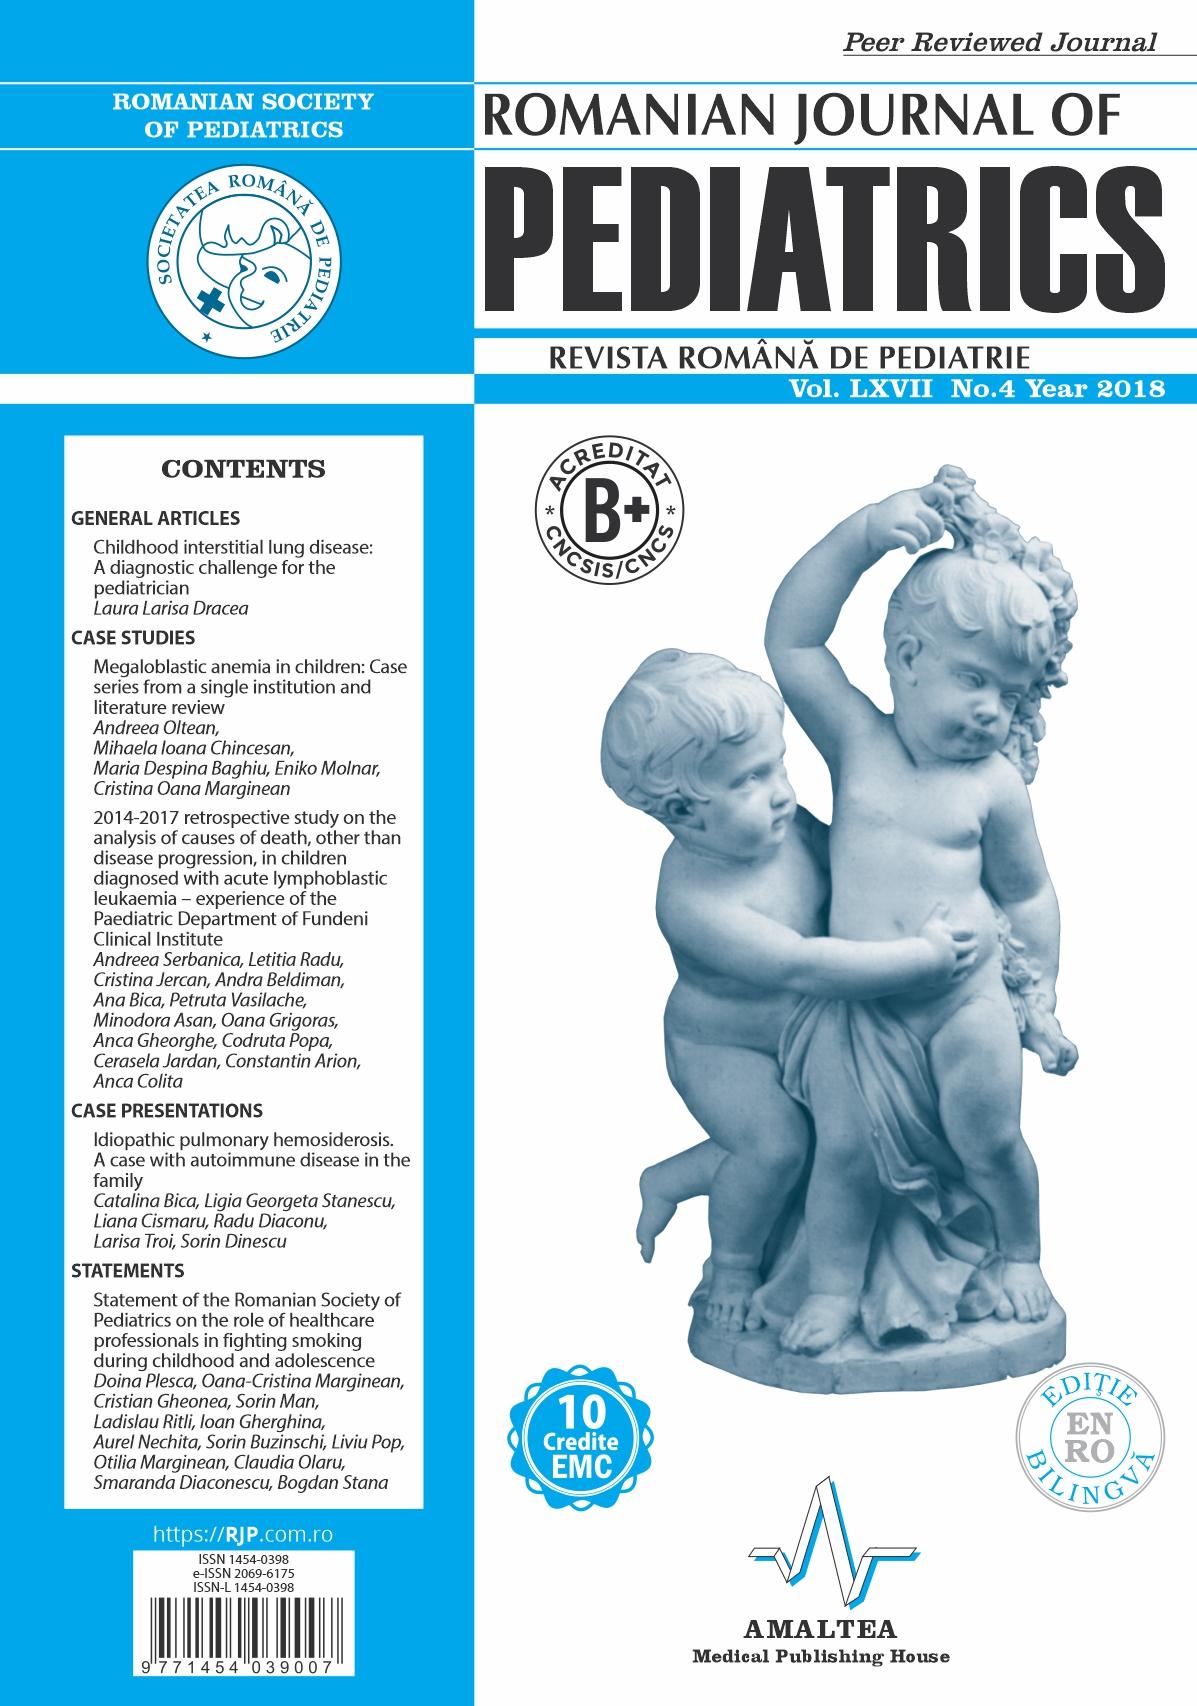 Romanian Journal of Pediatrics | Volume LXVII, No. 4, Year 2018